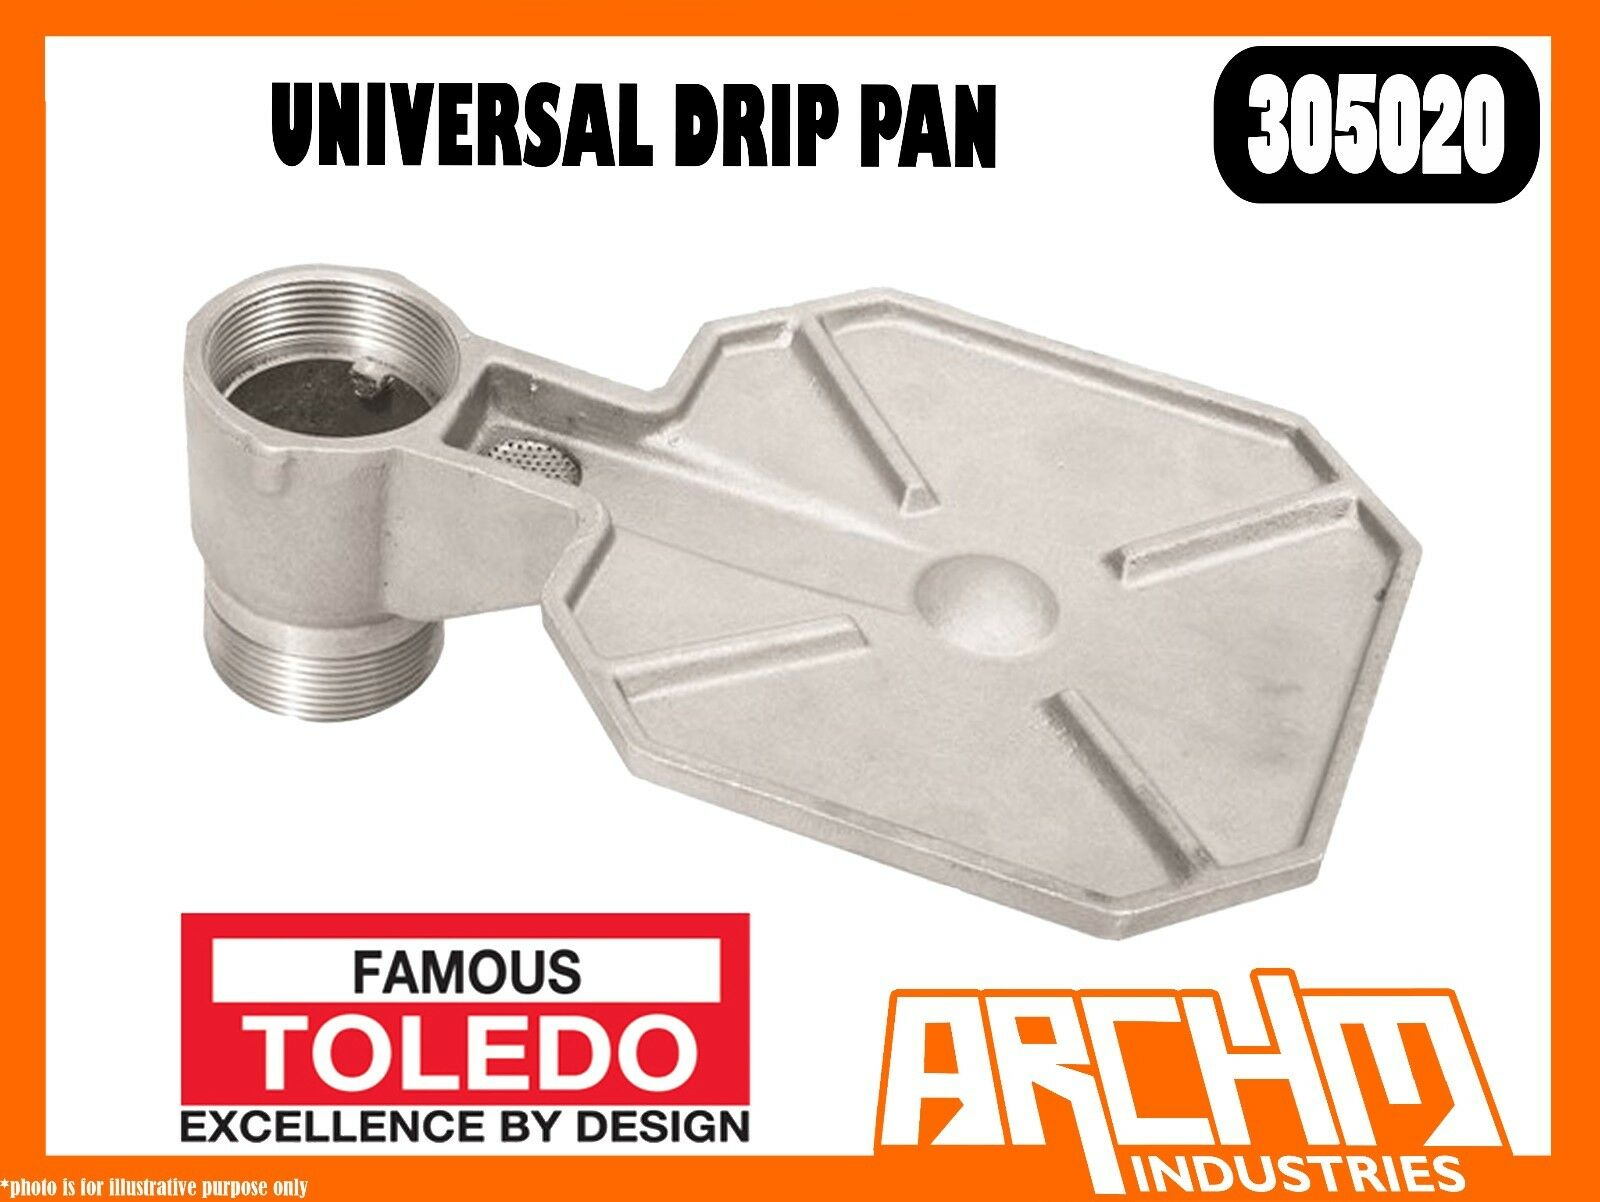 TOLEDO 305020 - UNIVERSAL DRIP PAN - ALUMINIUM MEDIA 2  BUNG ADAPTOR DRUM PUMP